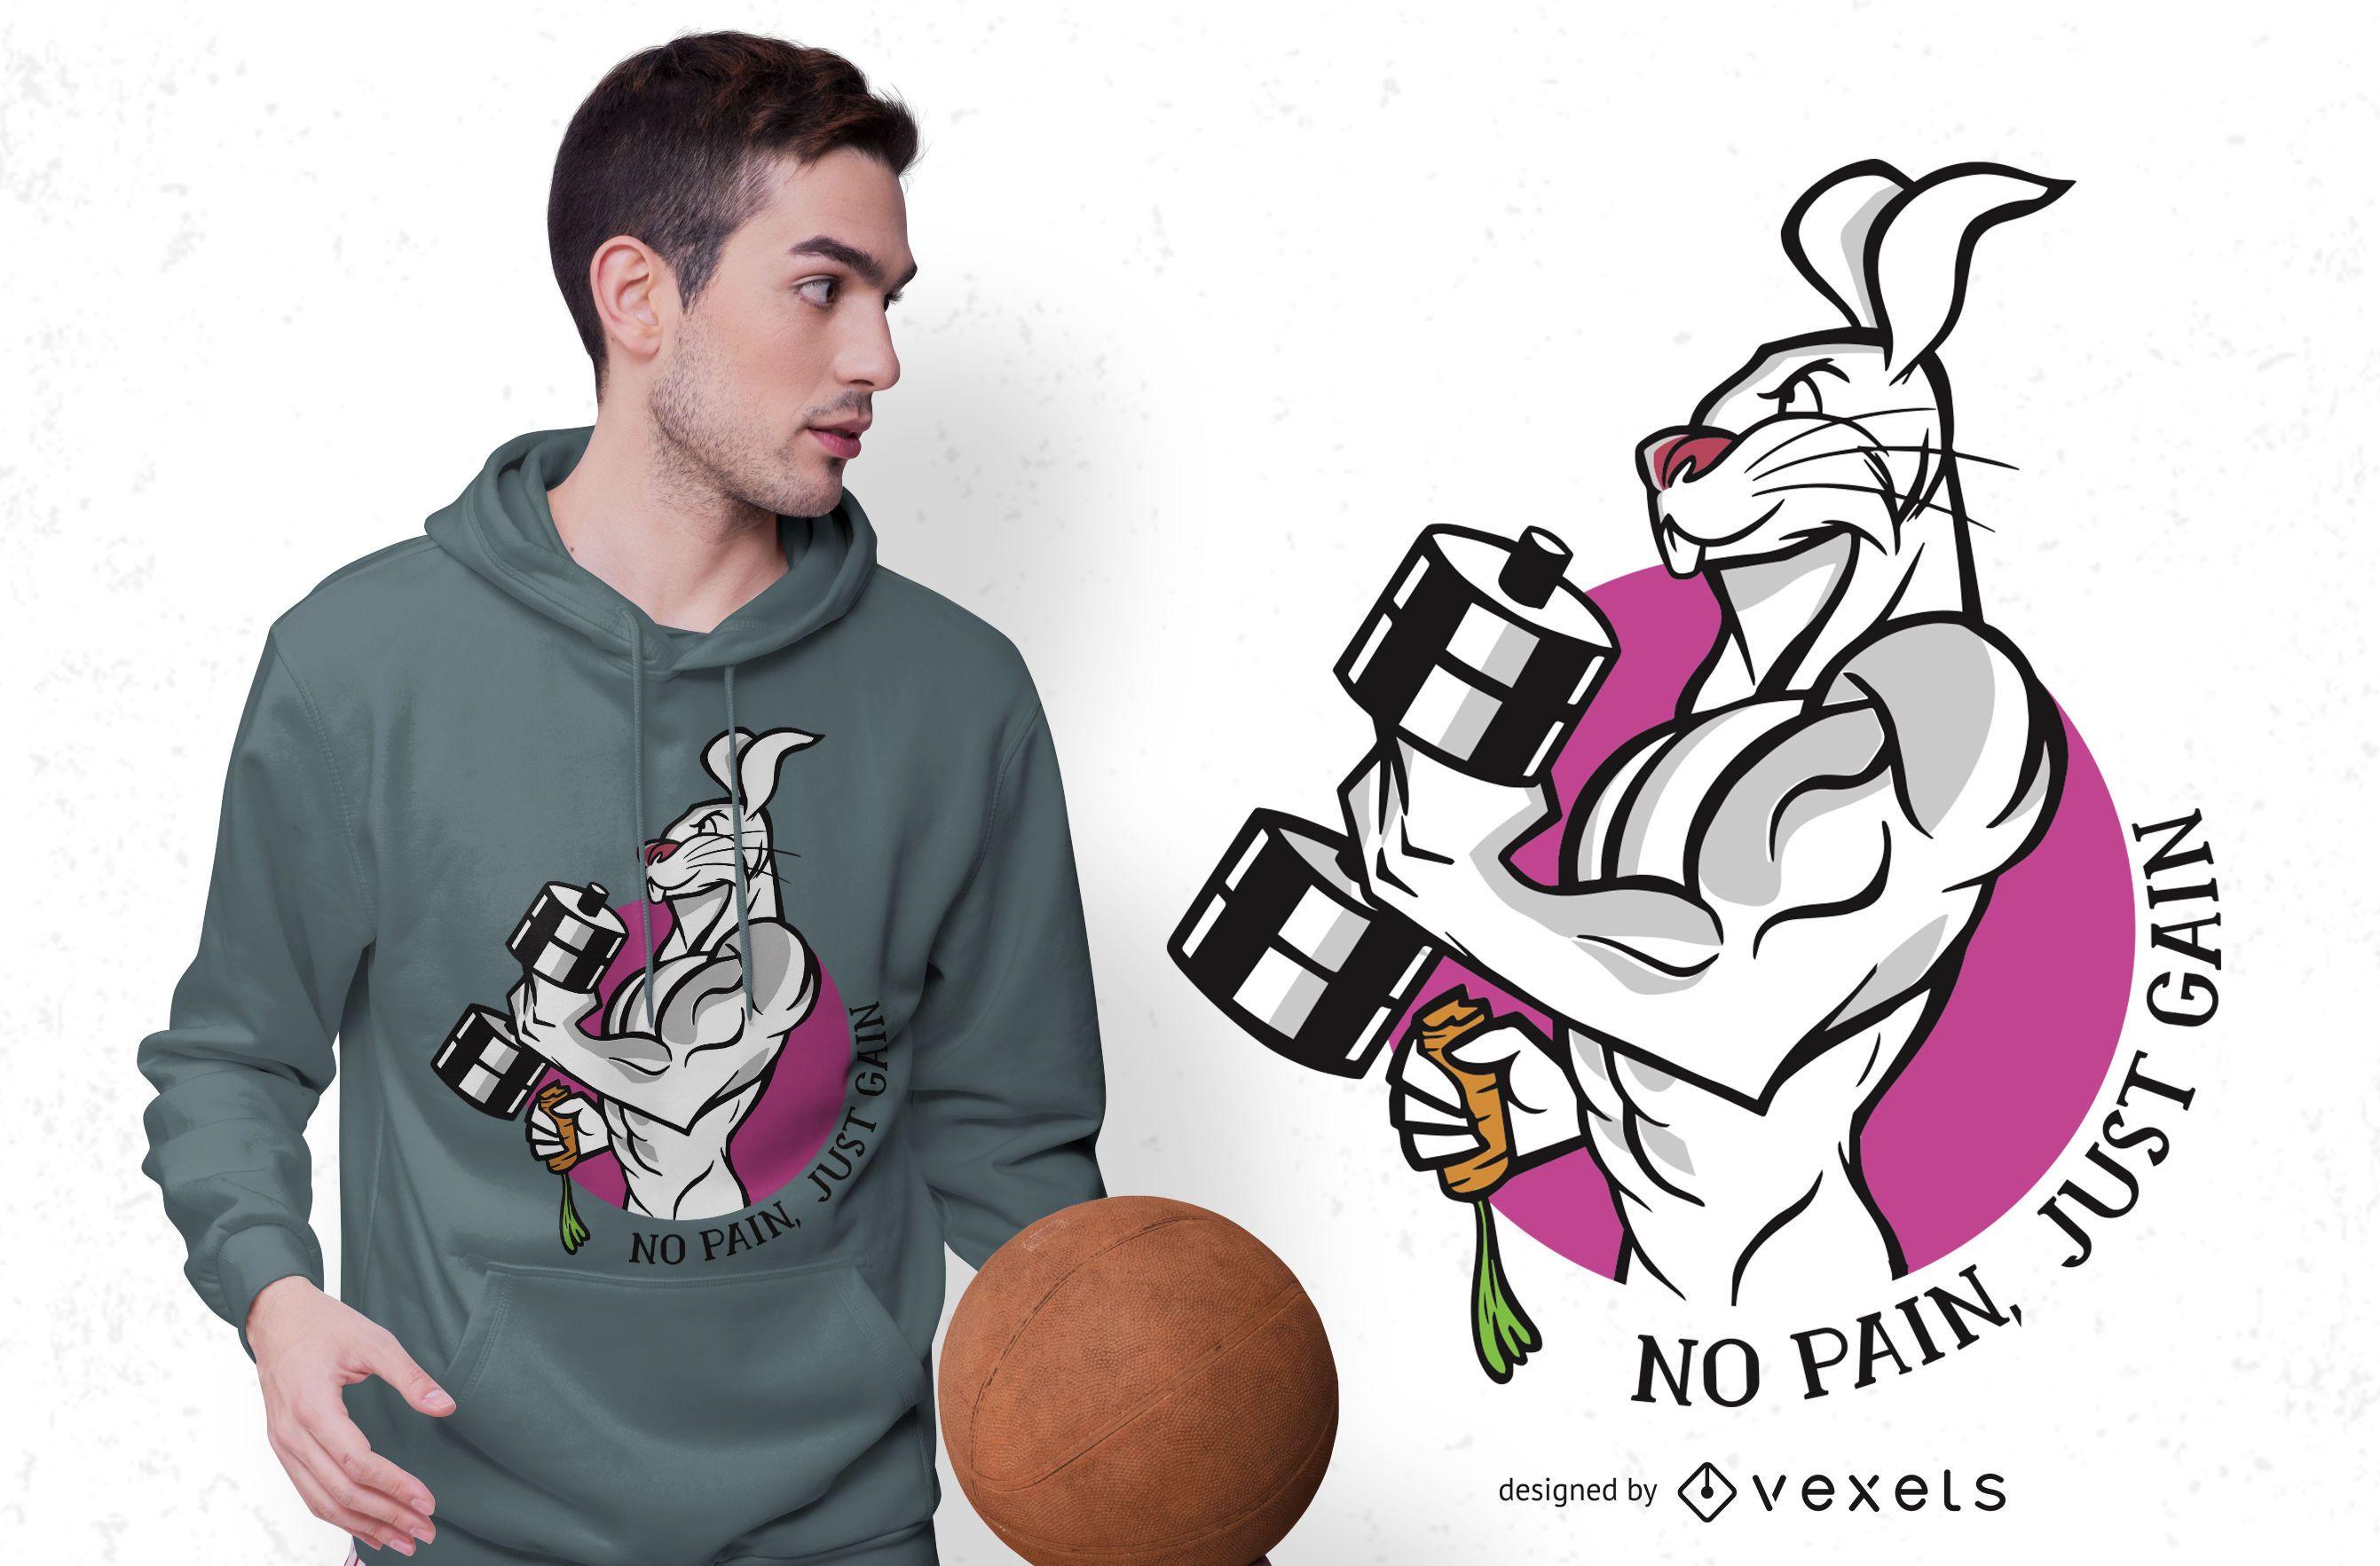 No pain rabbit t-shirt design